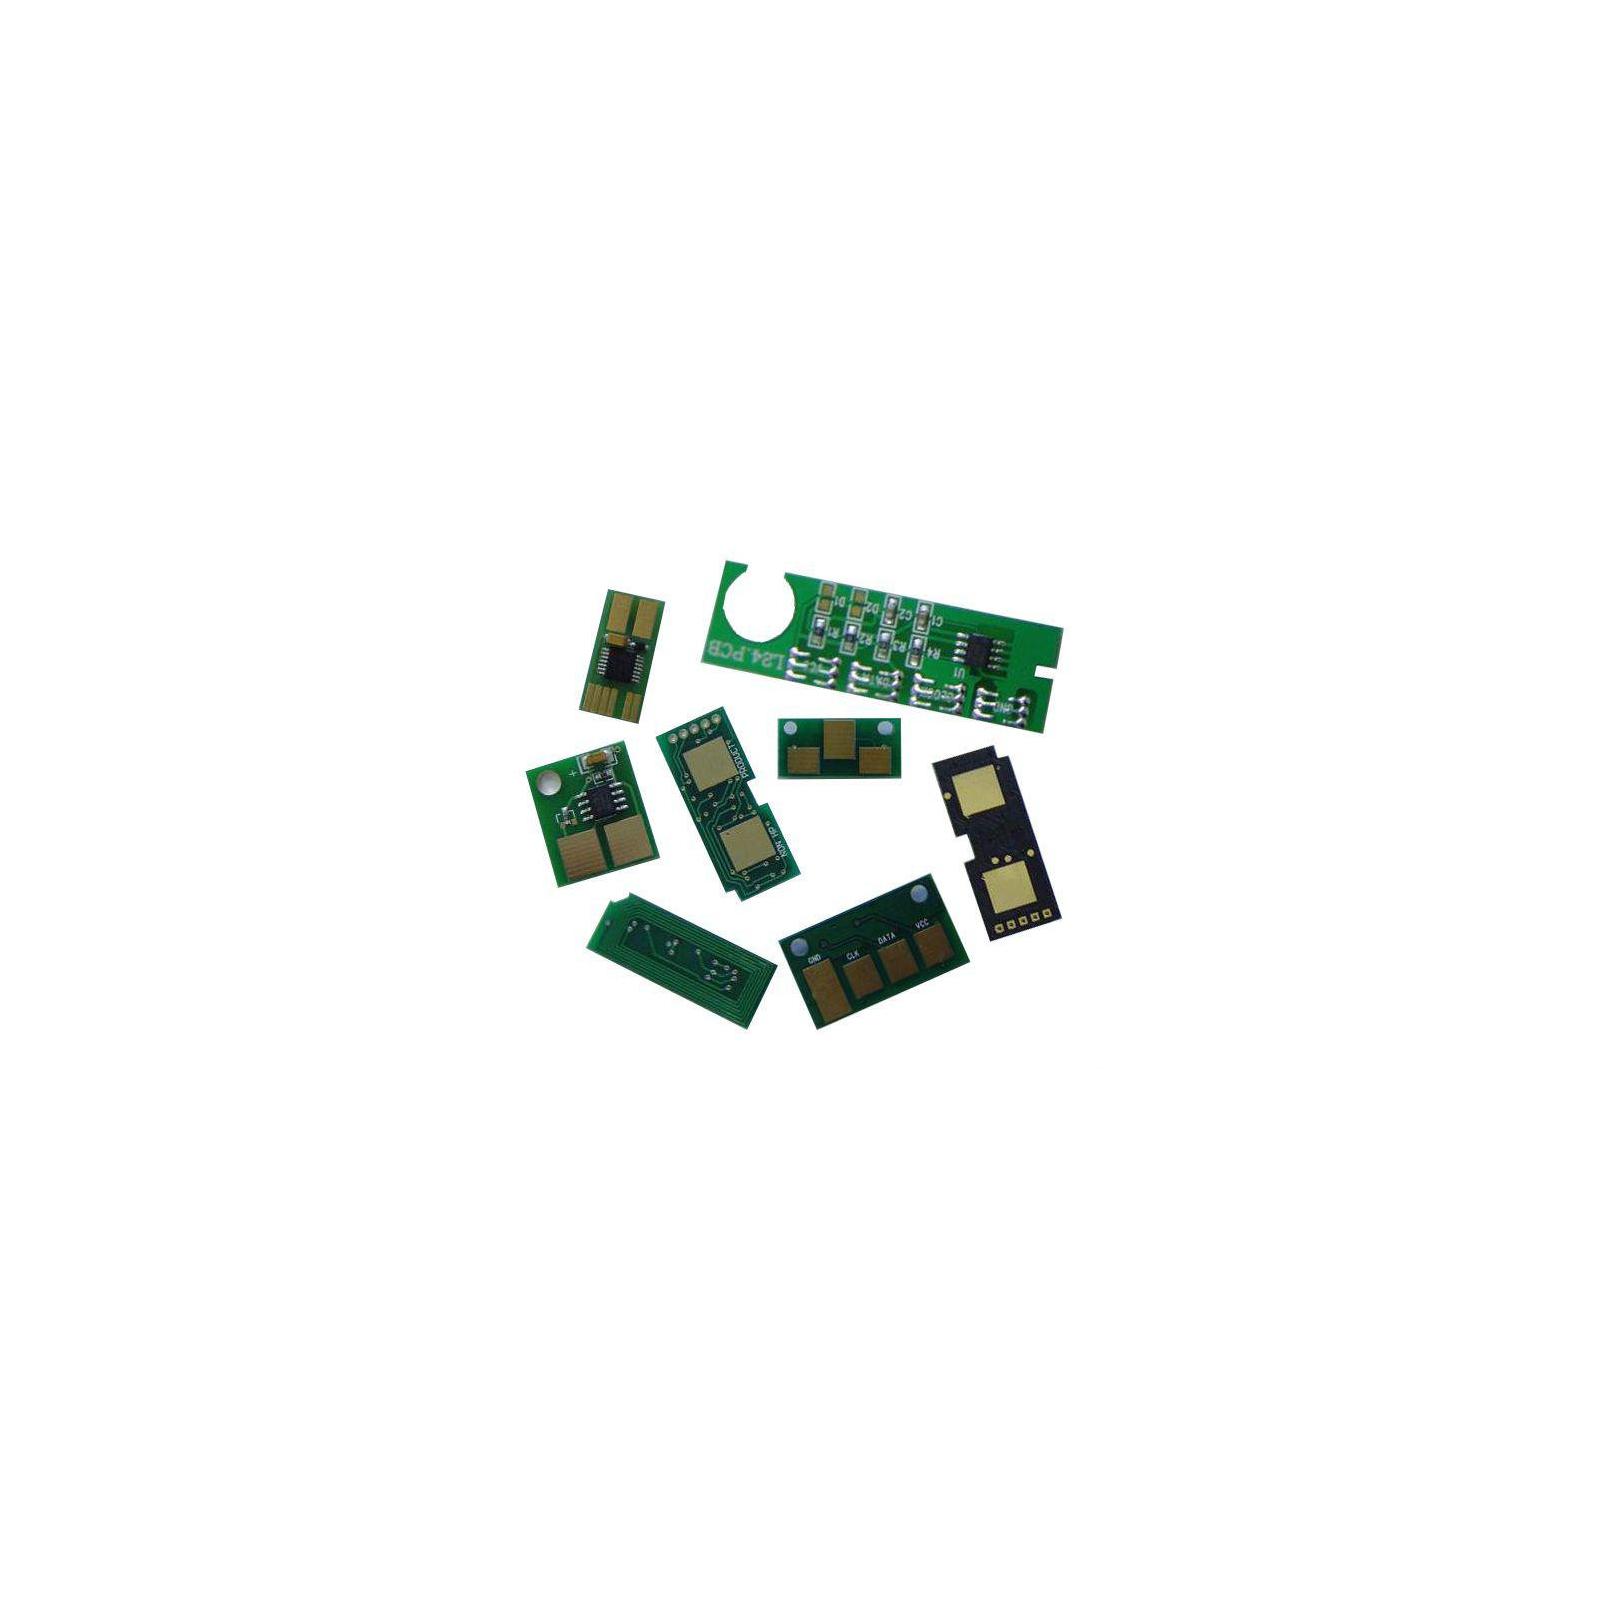 Чип для картриджа EPSON T7023 ДЛЯ WF-4015/4525 MAGENTA Apex (CHIP-EPS-T7023-M)